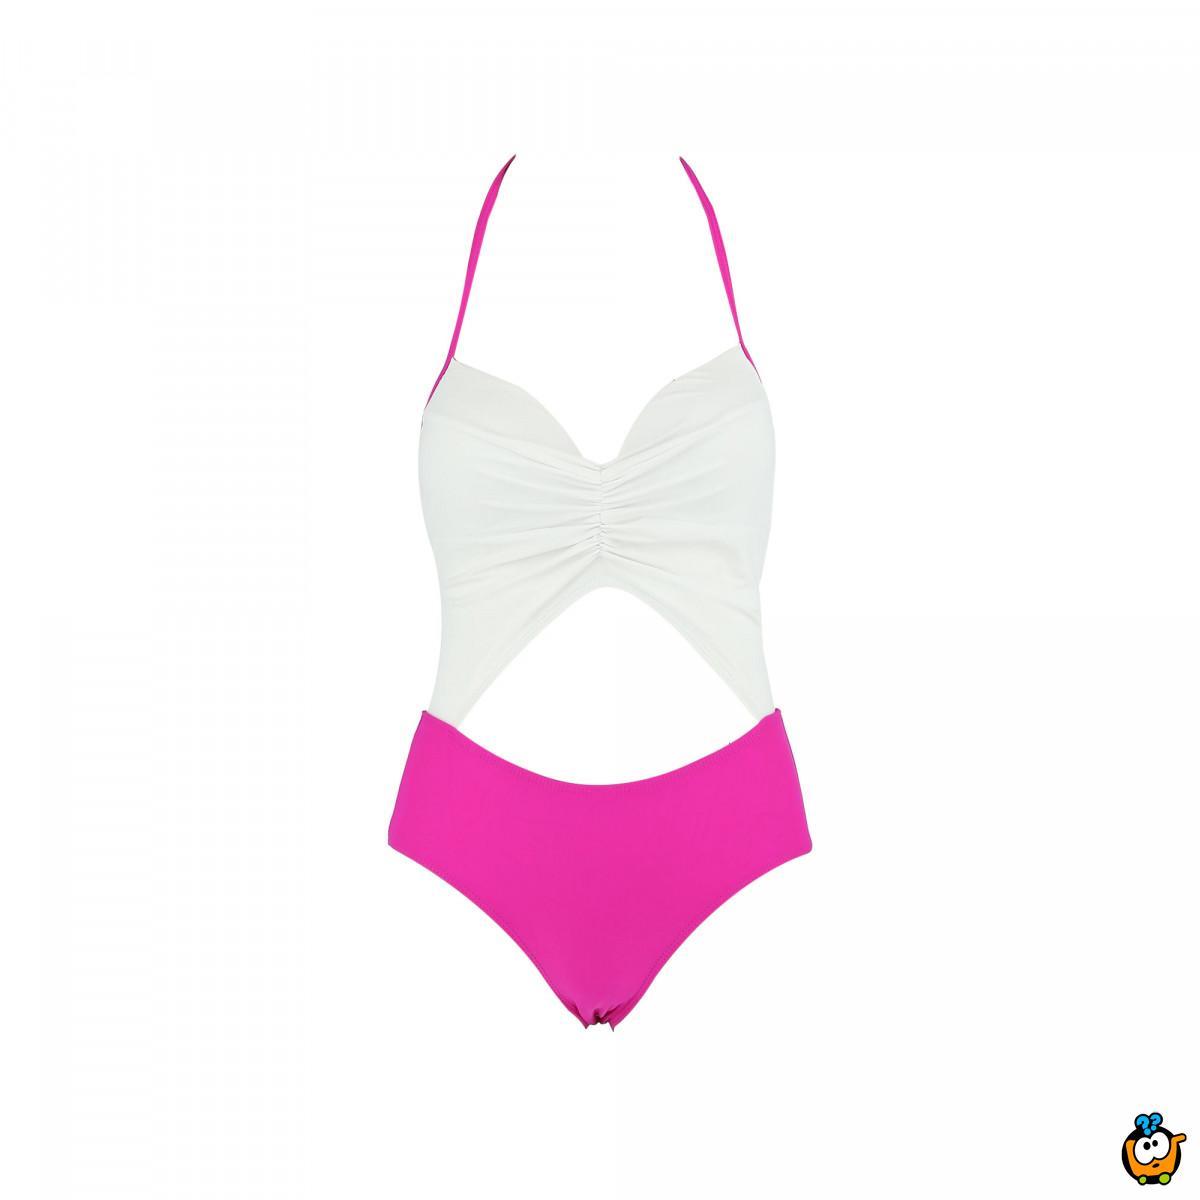 Jednodelni ženski kupaći kostim - RETRO LONG